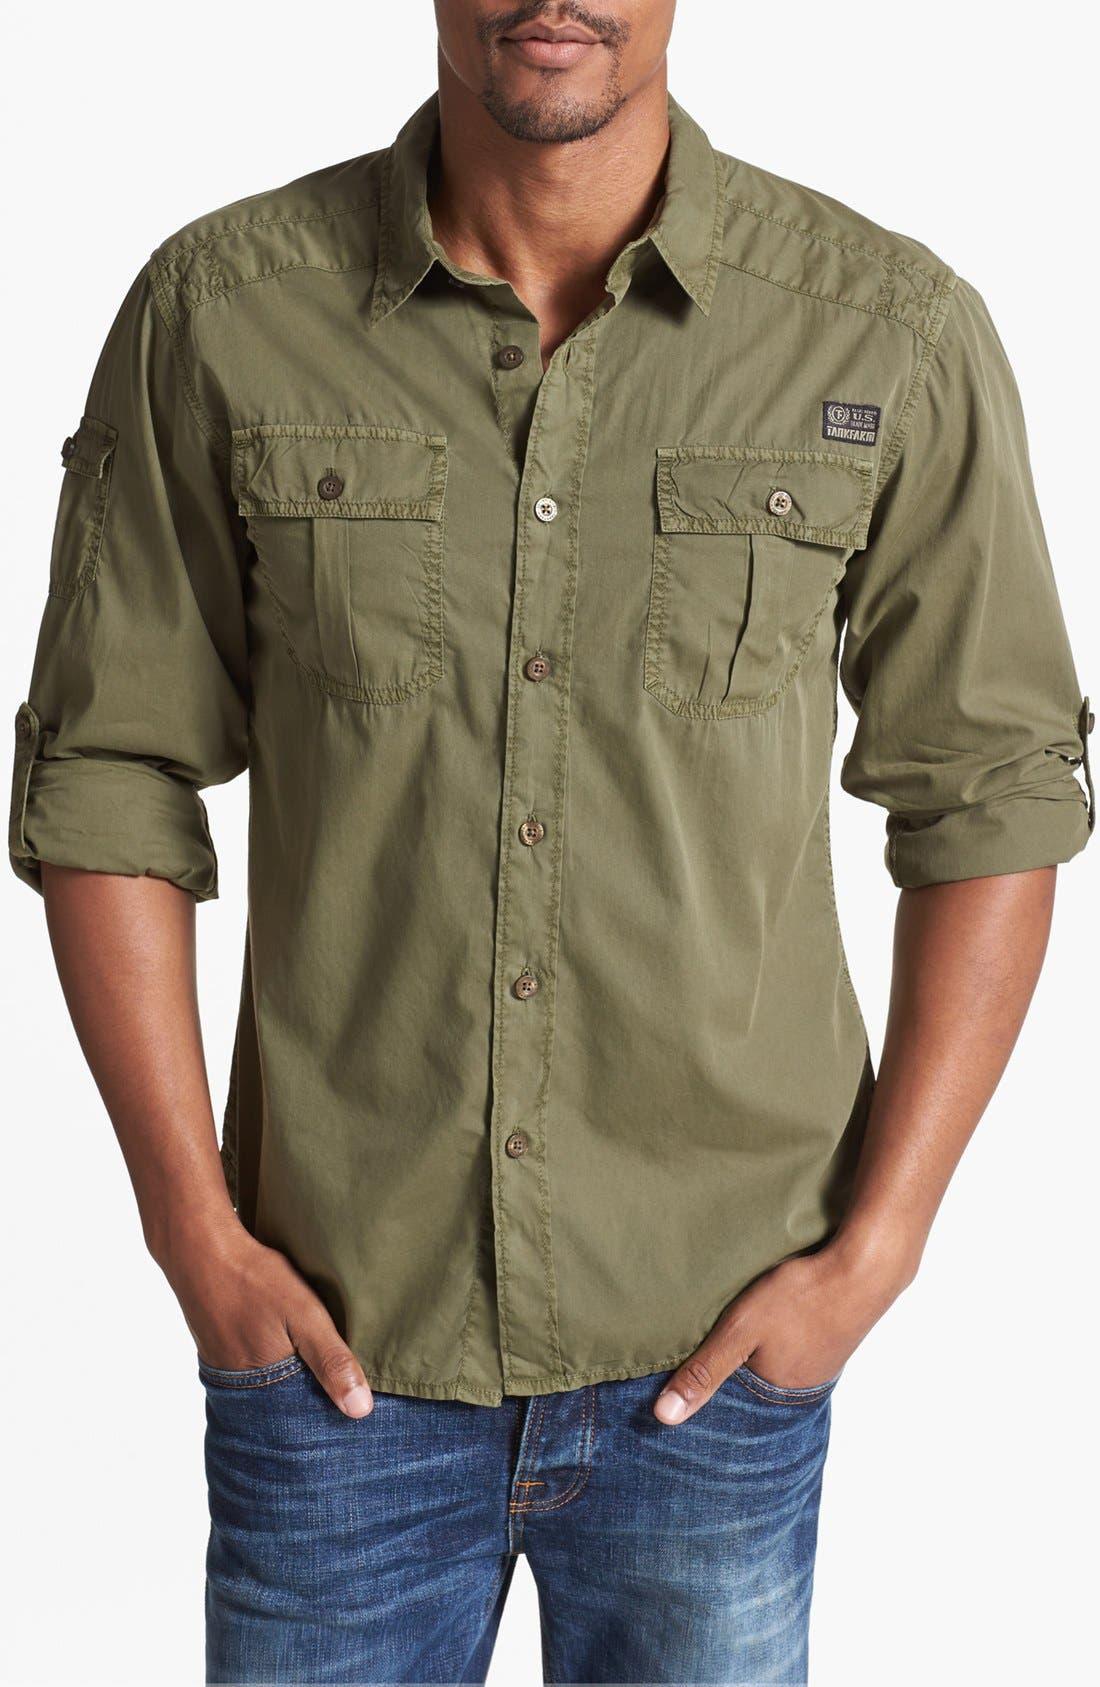 Main Image - Tankfarm 'Deploy' Woven Shirt